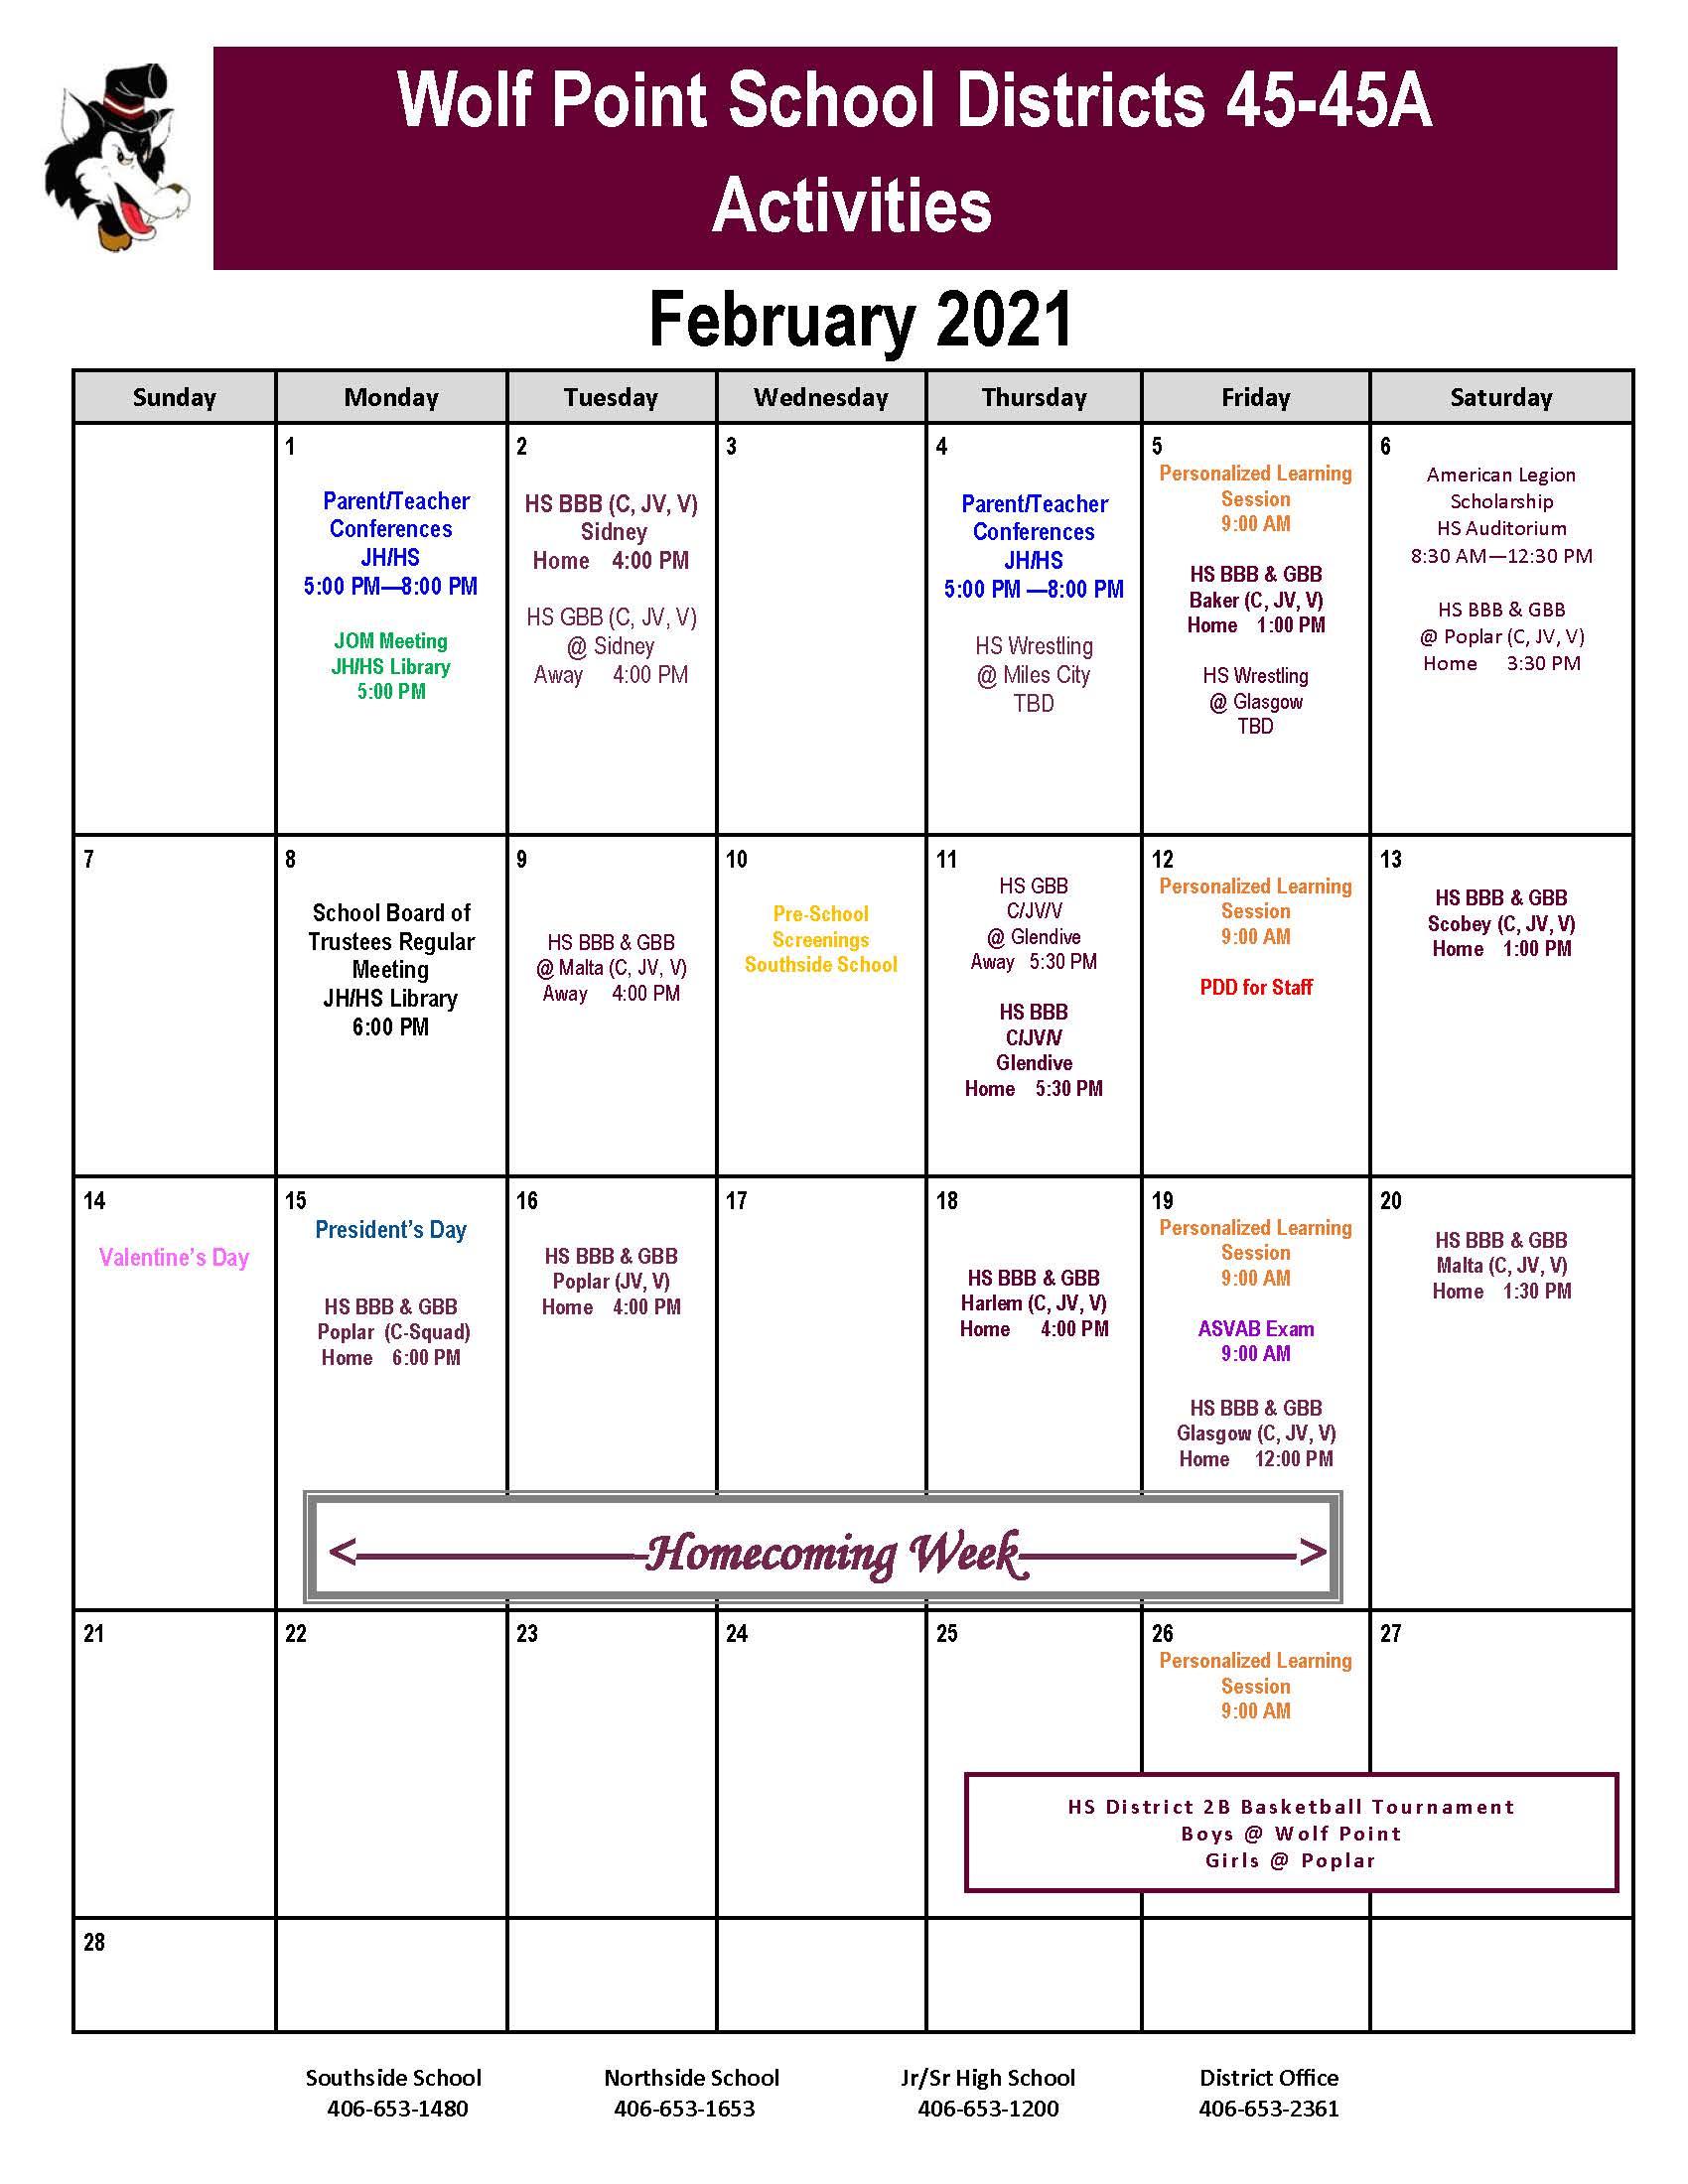 ACTIVITY CALENDAR _FEBRUARY 2021